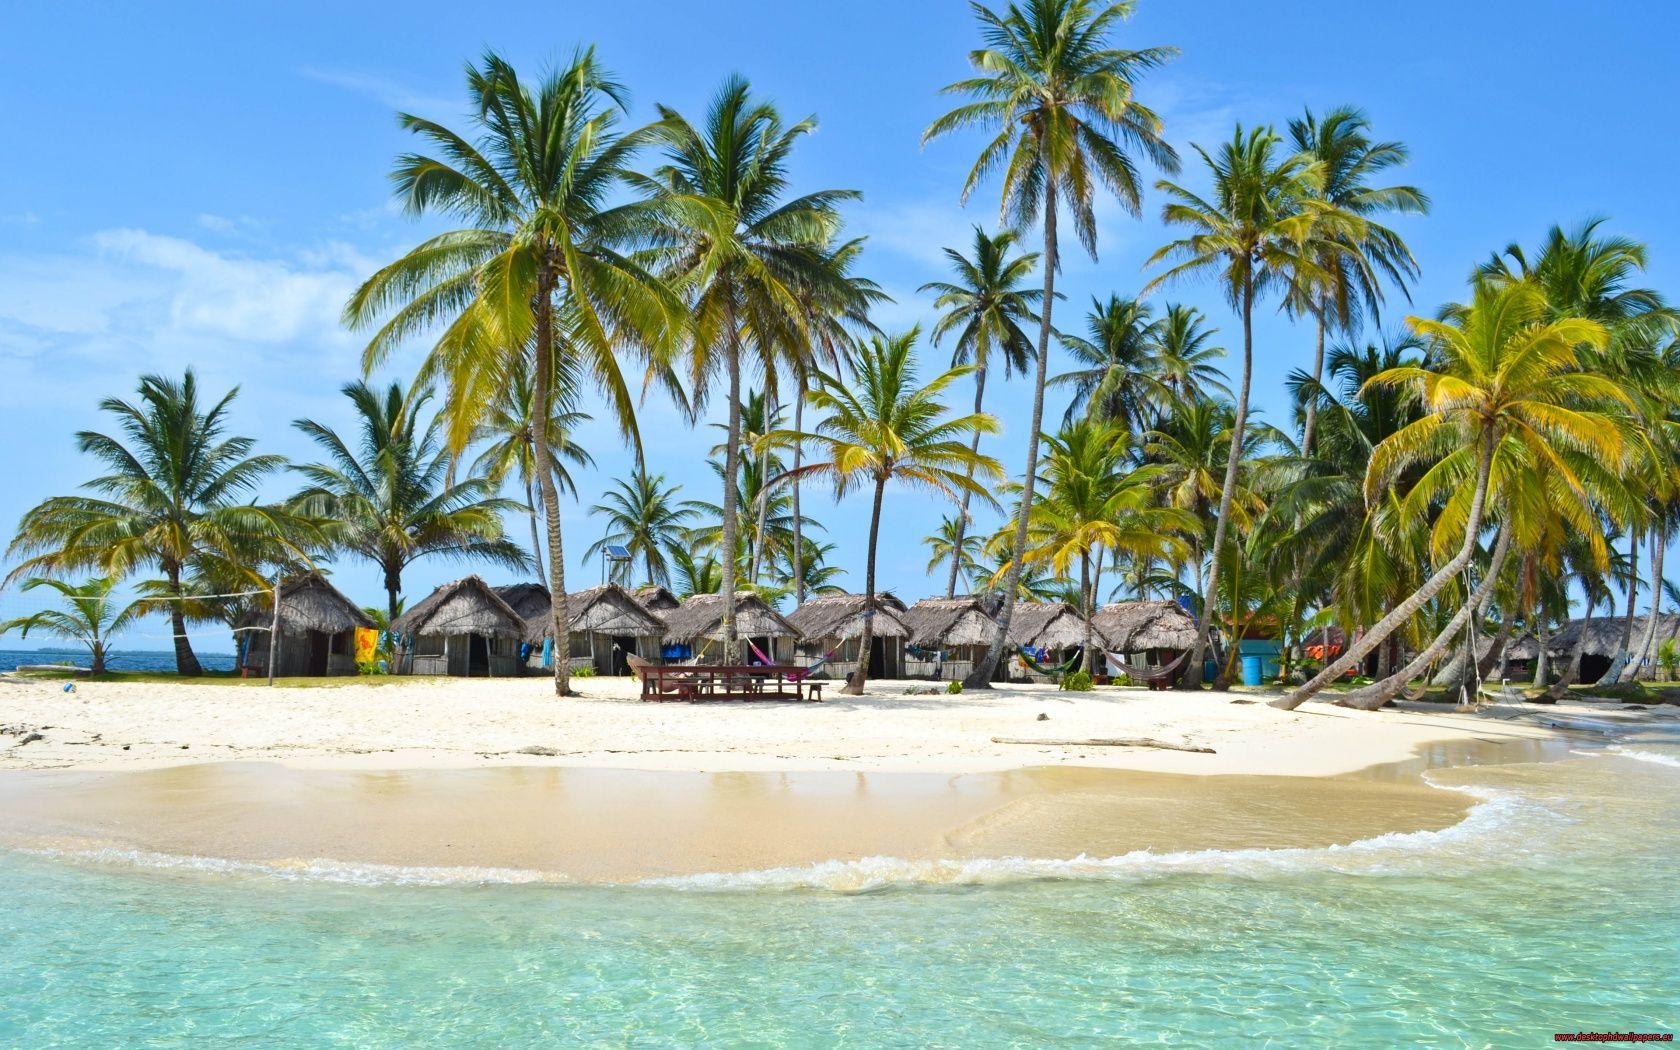 Maldives Tropical Resort Wallpaper In 1680x1050 Resolution Malediven Panama Reise Strandideen